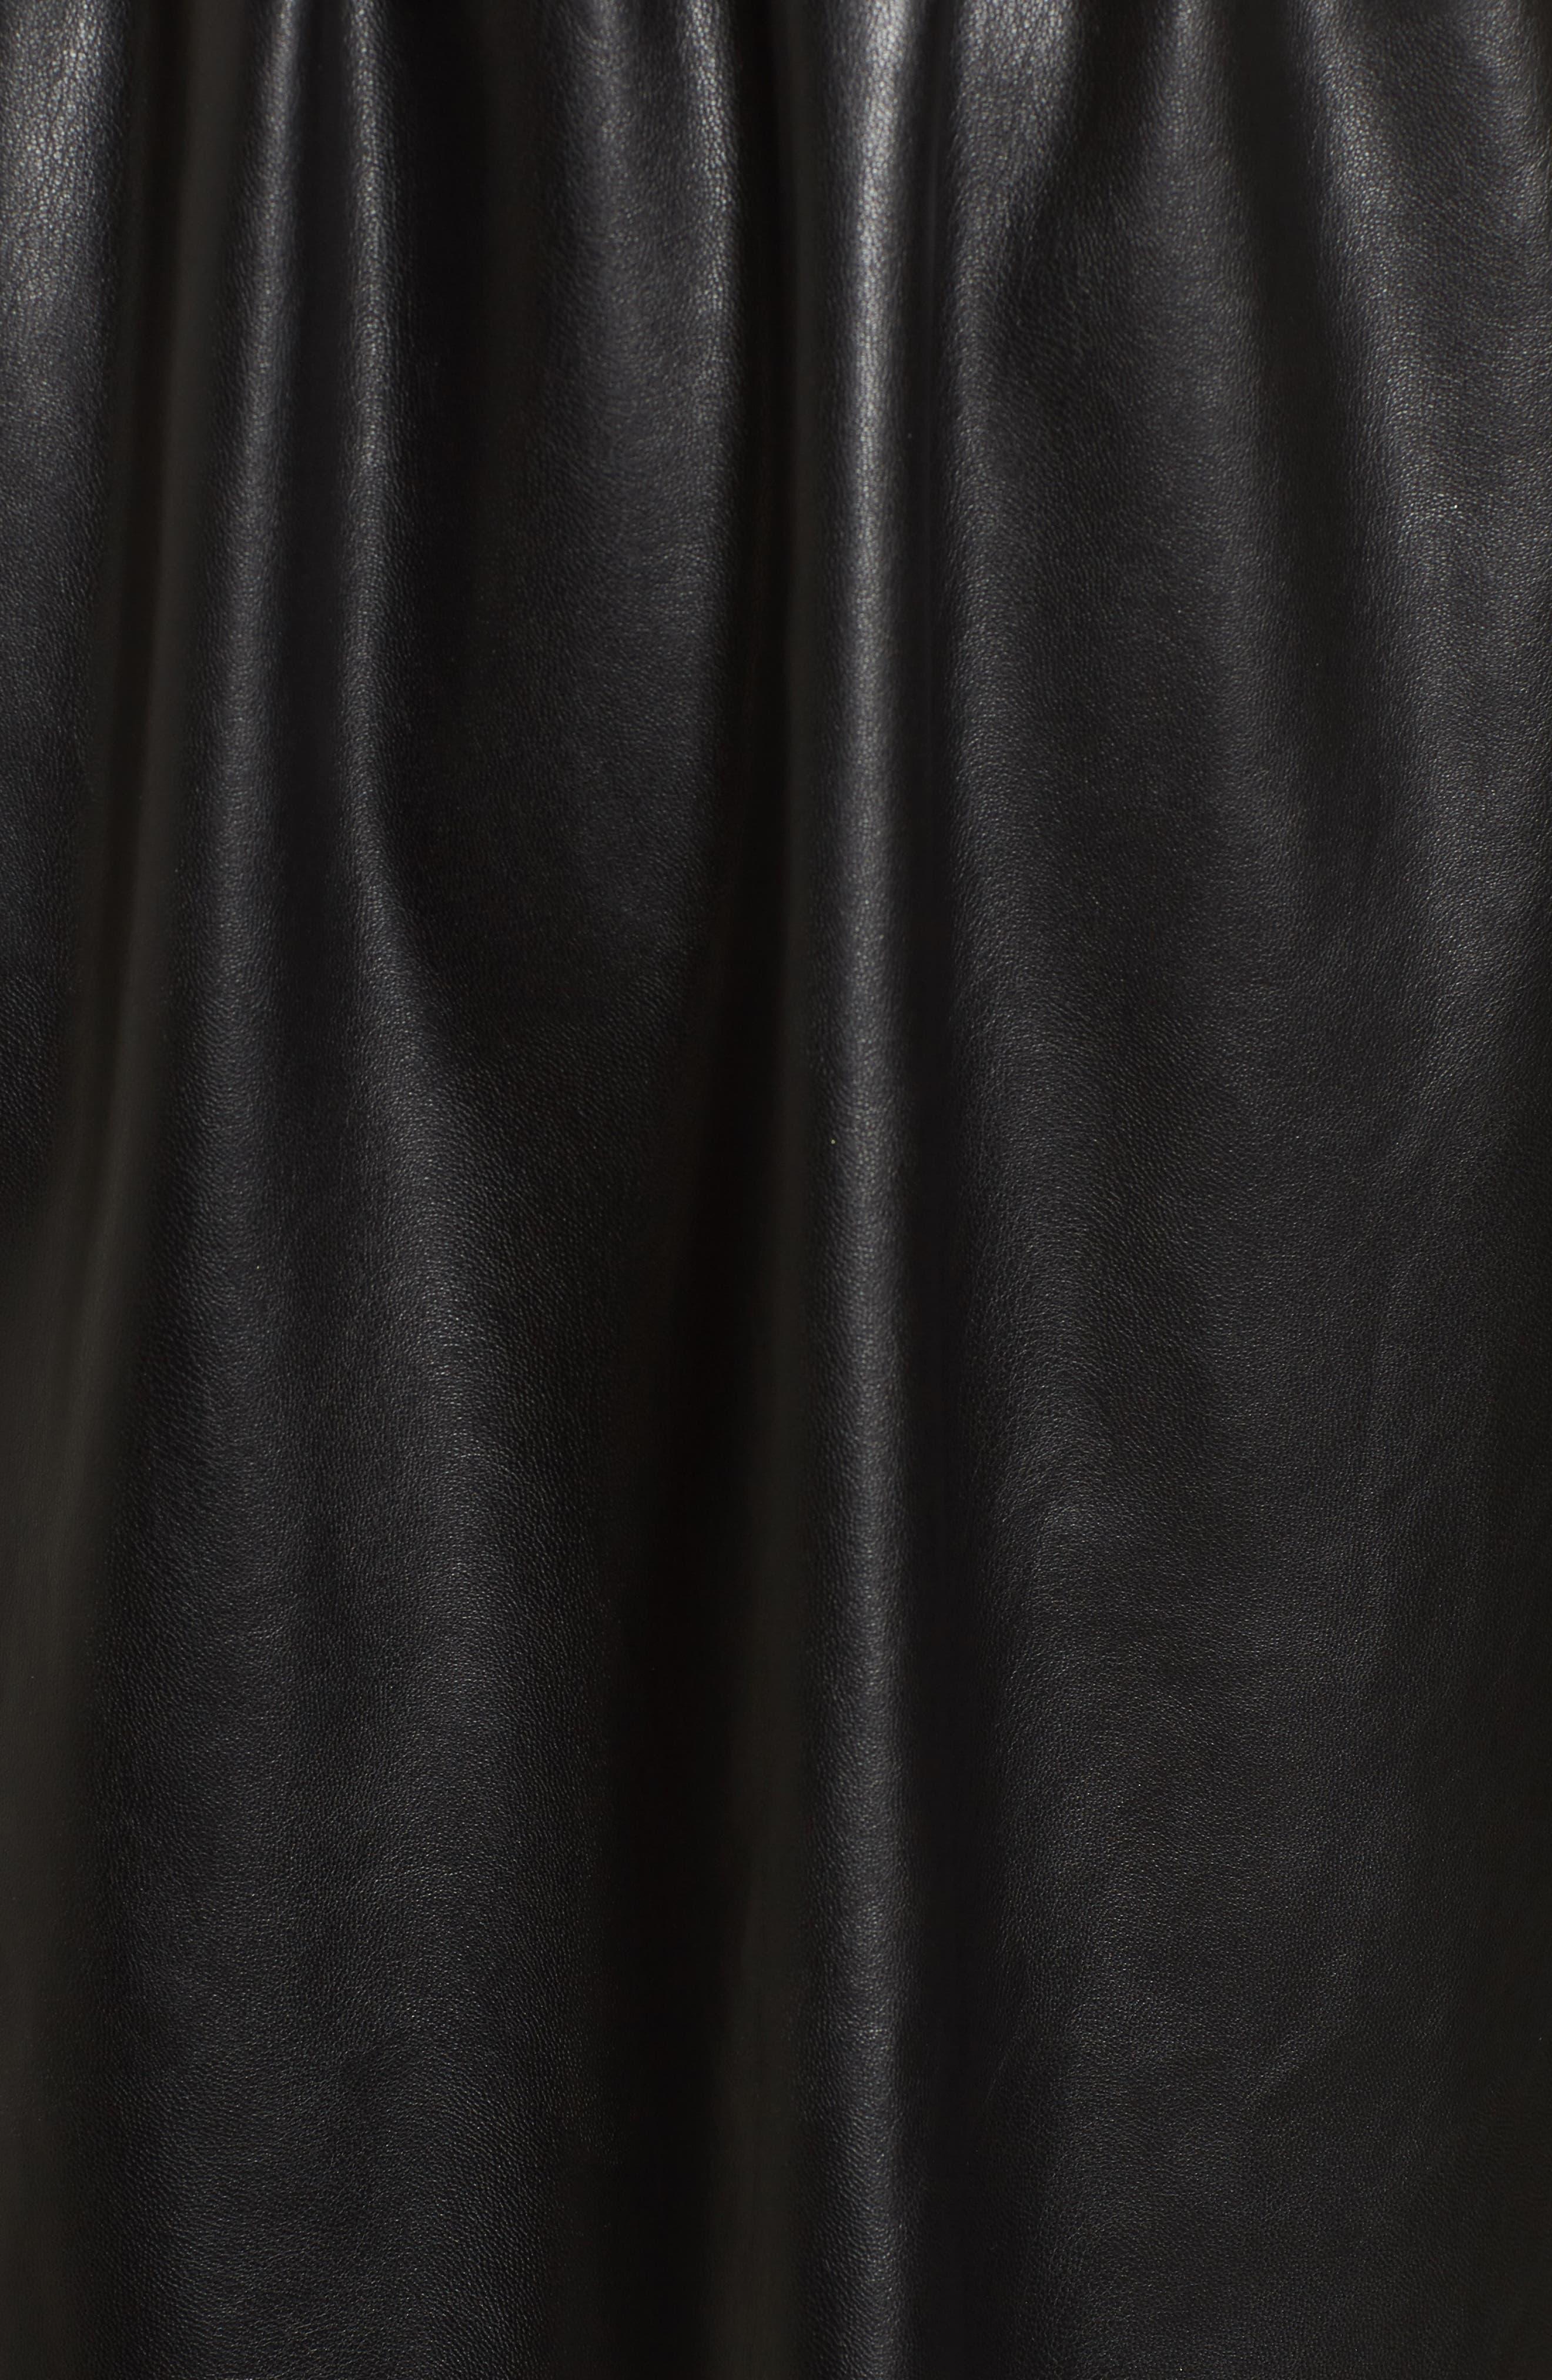 Faux Leather Skater Dress,                             Alternate thumbnail 5, color,                             Black